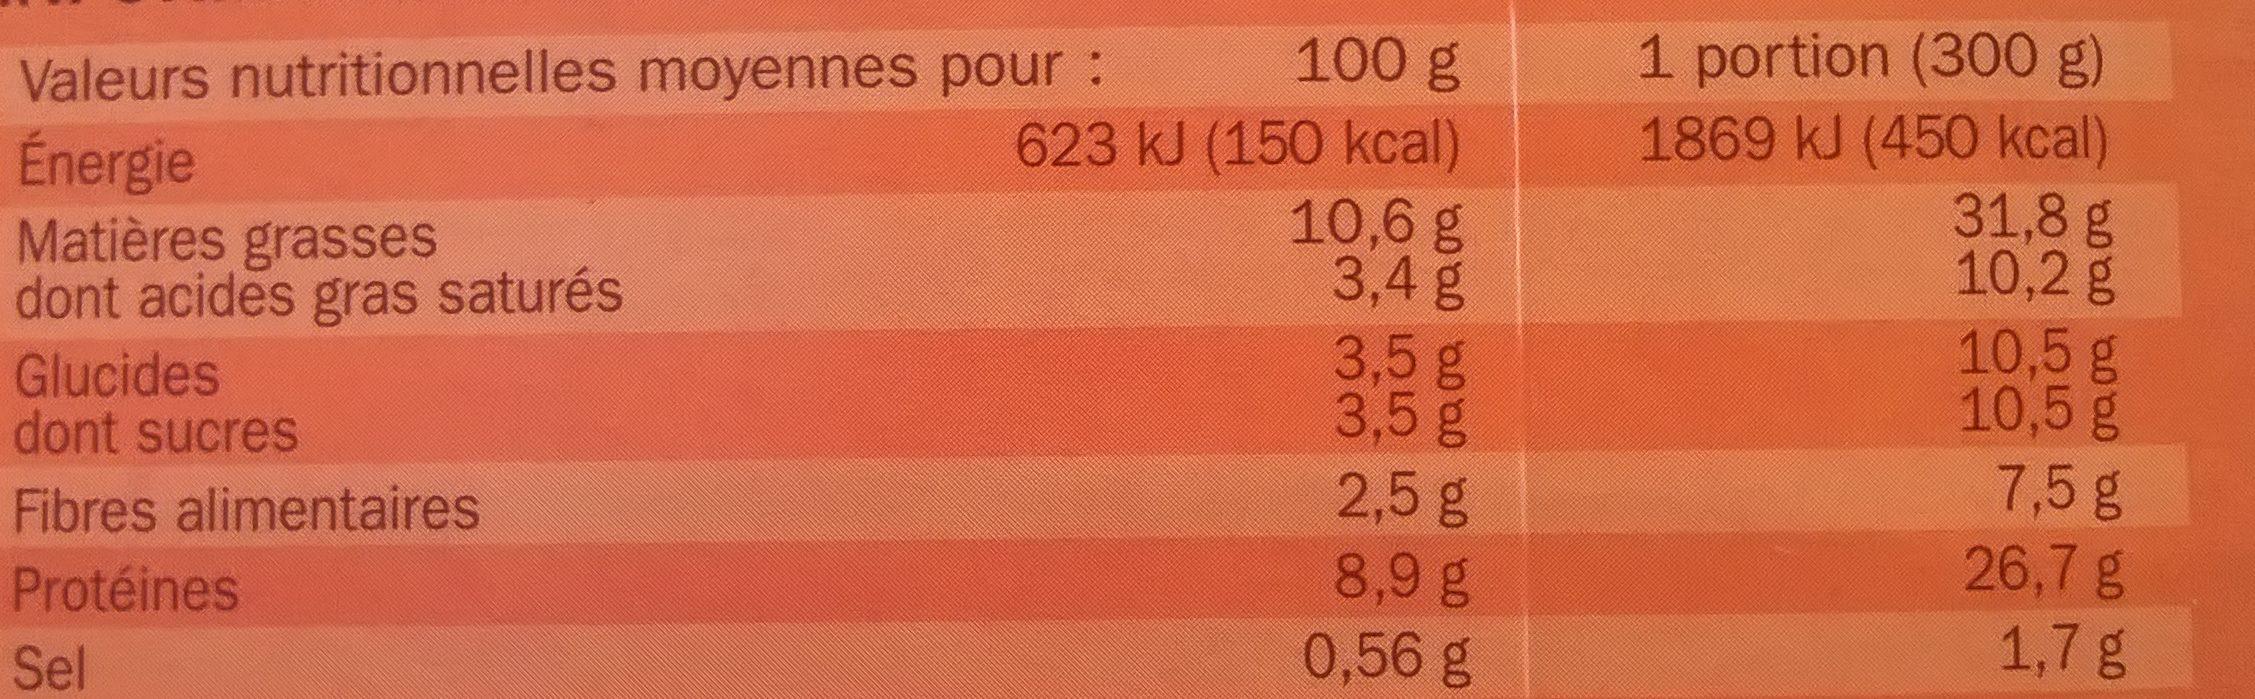 Moussaka - Informations nutritionnelles - fr